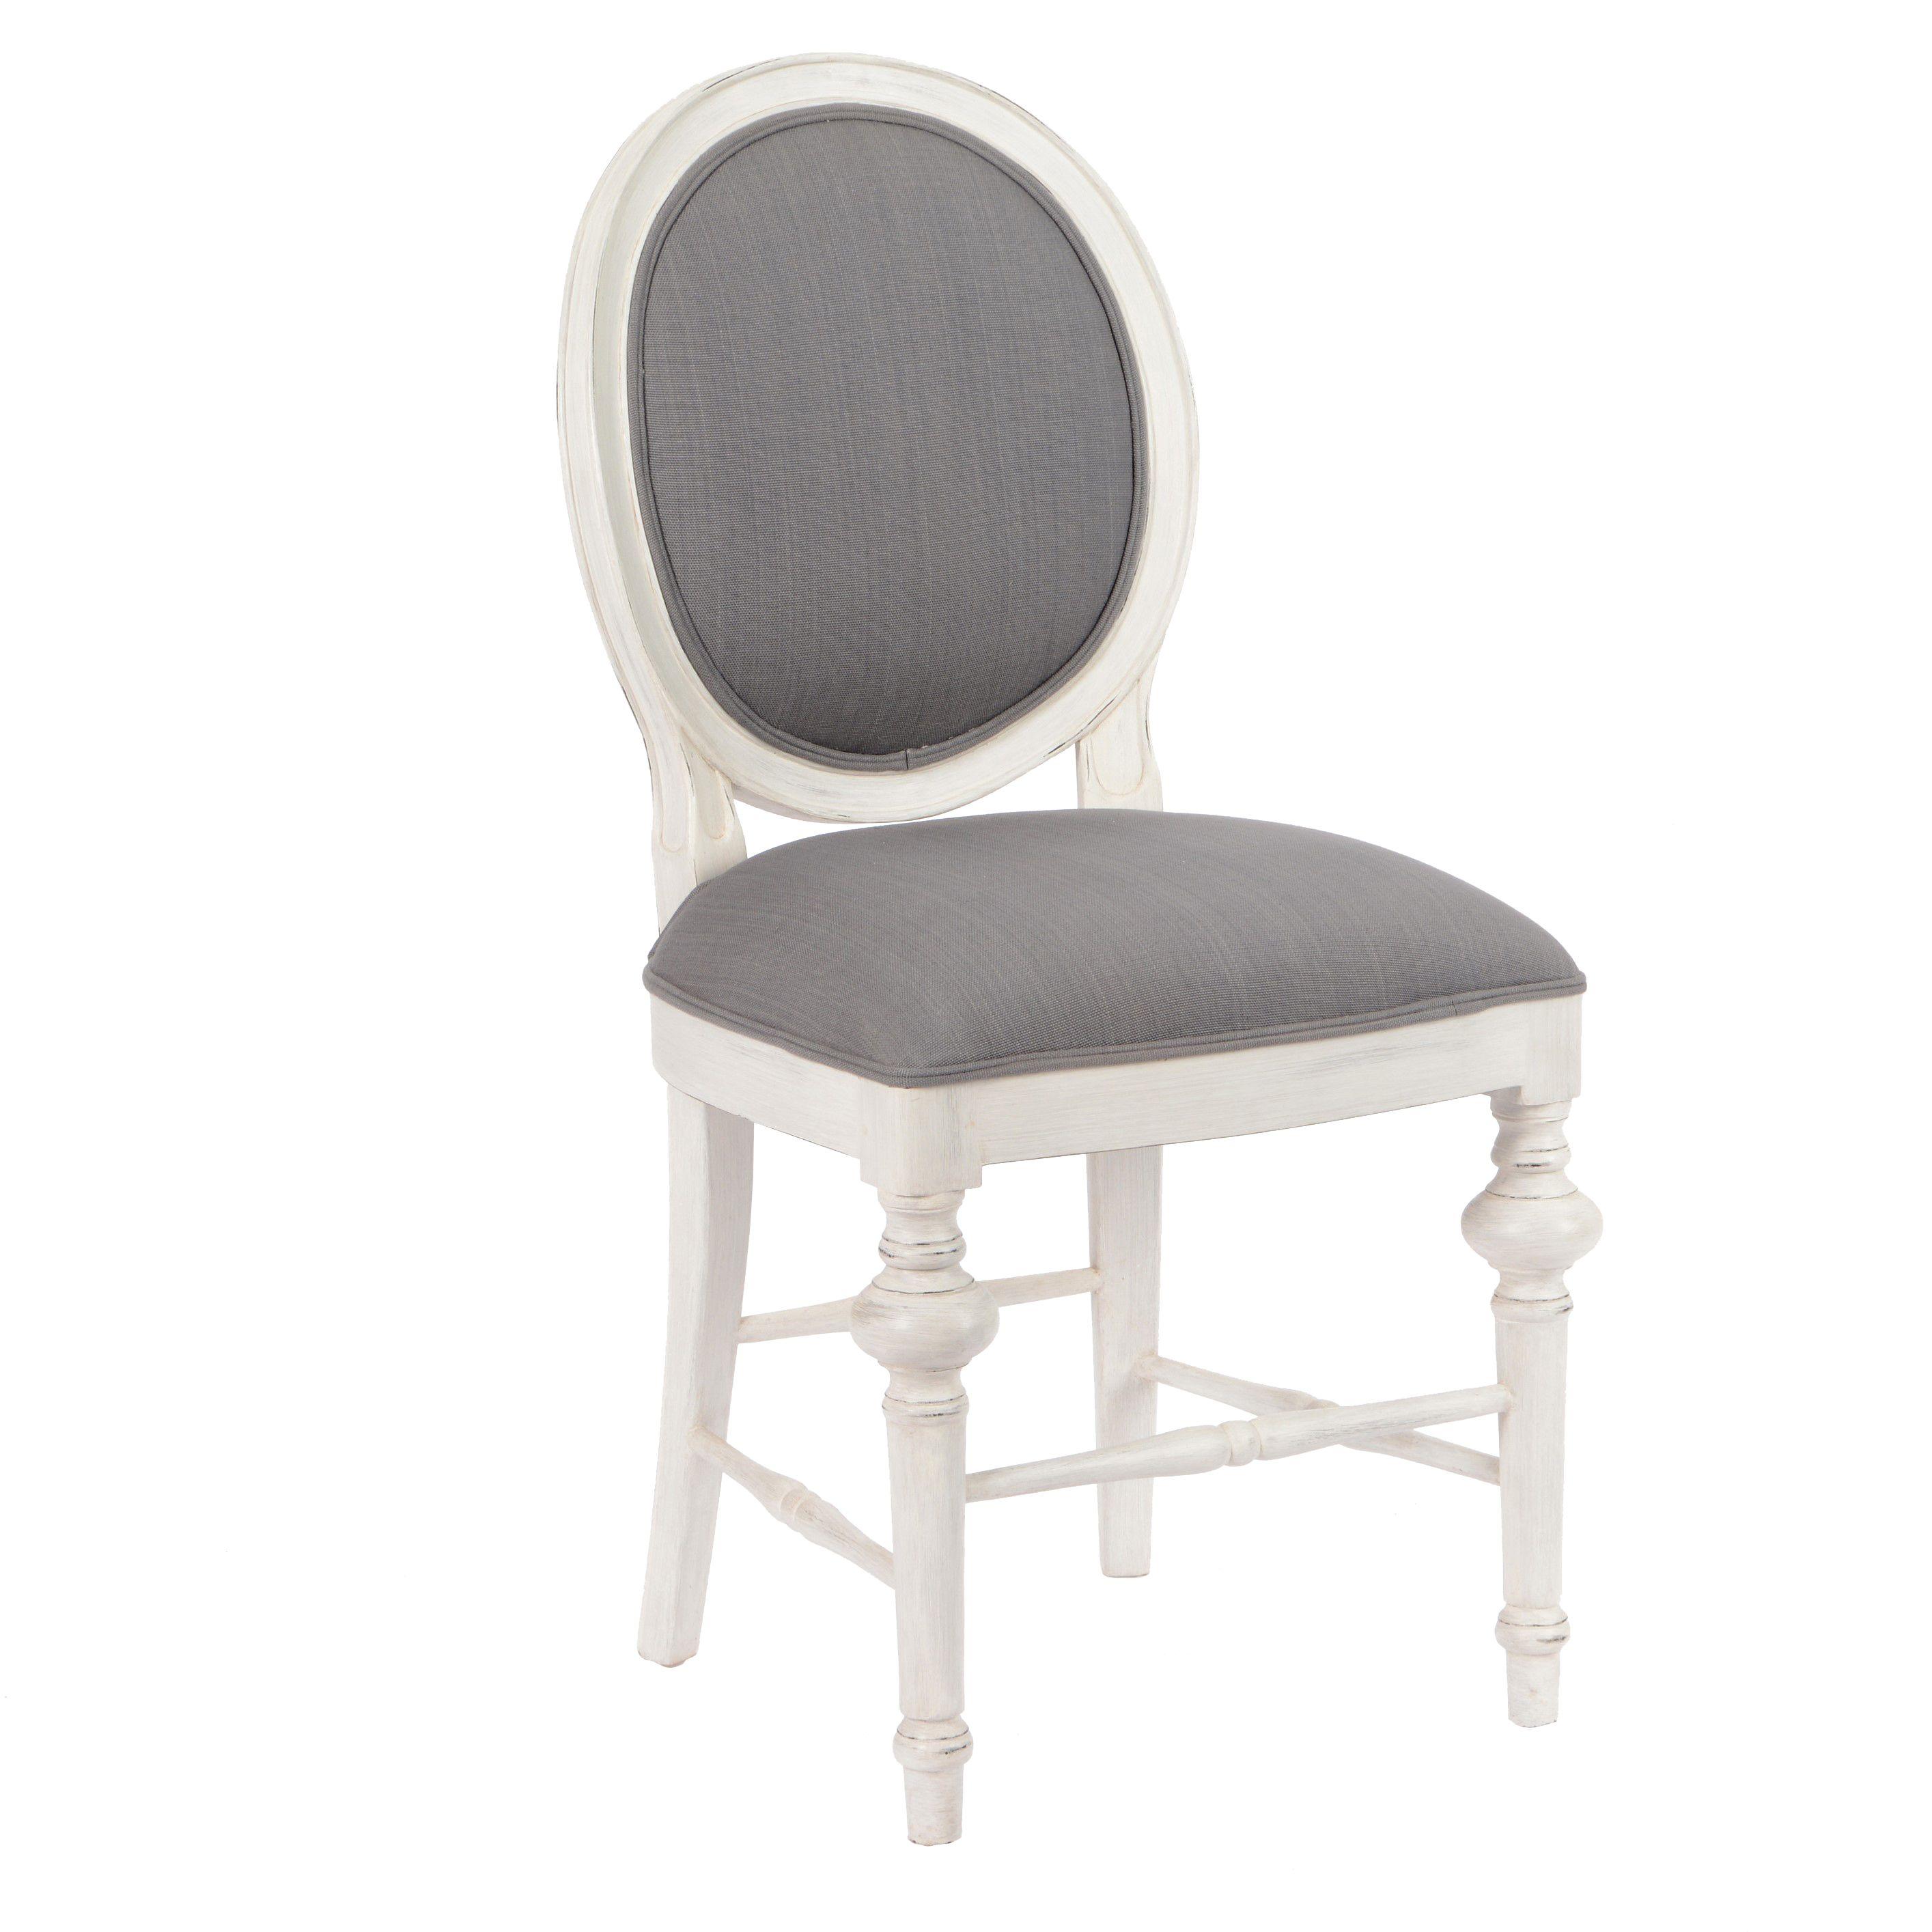 Chaise Medaillon Baroque Heritage Bois Blanchi Tissu Gris 50x53x96cm Amadeus Tissu Gris Chaise Medaillon Chaise